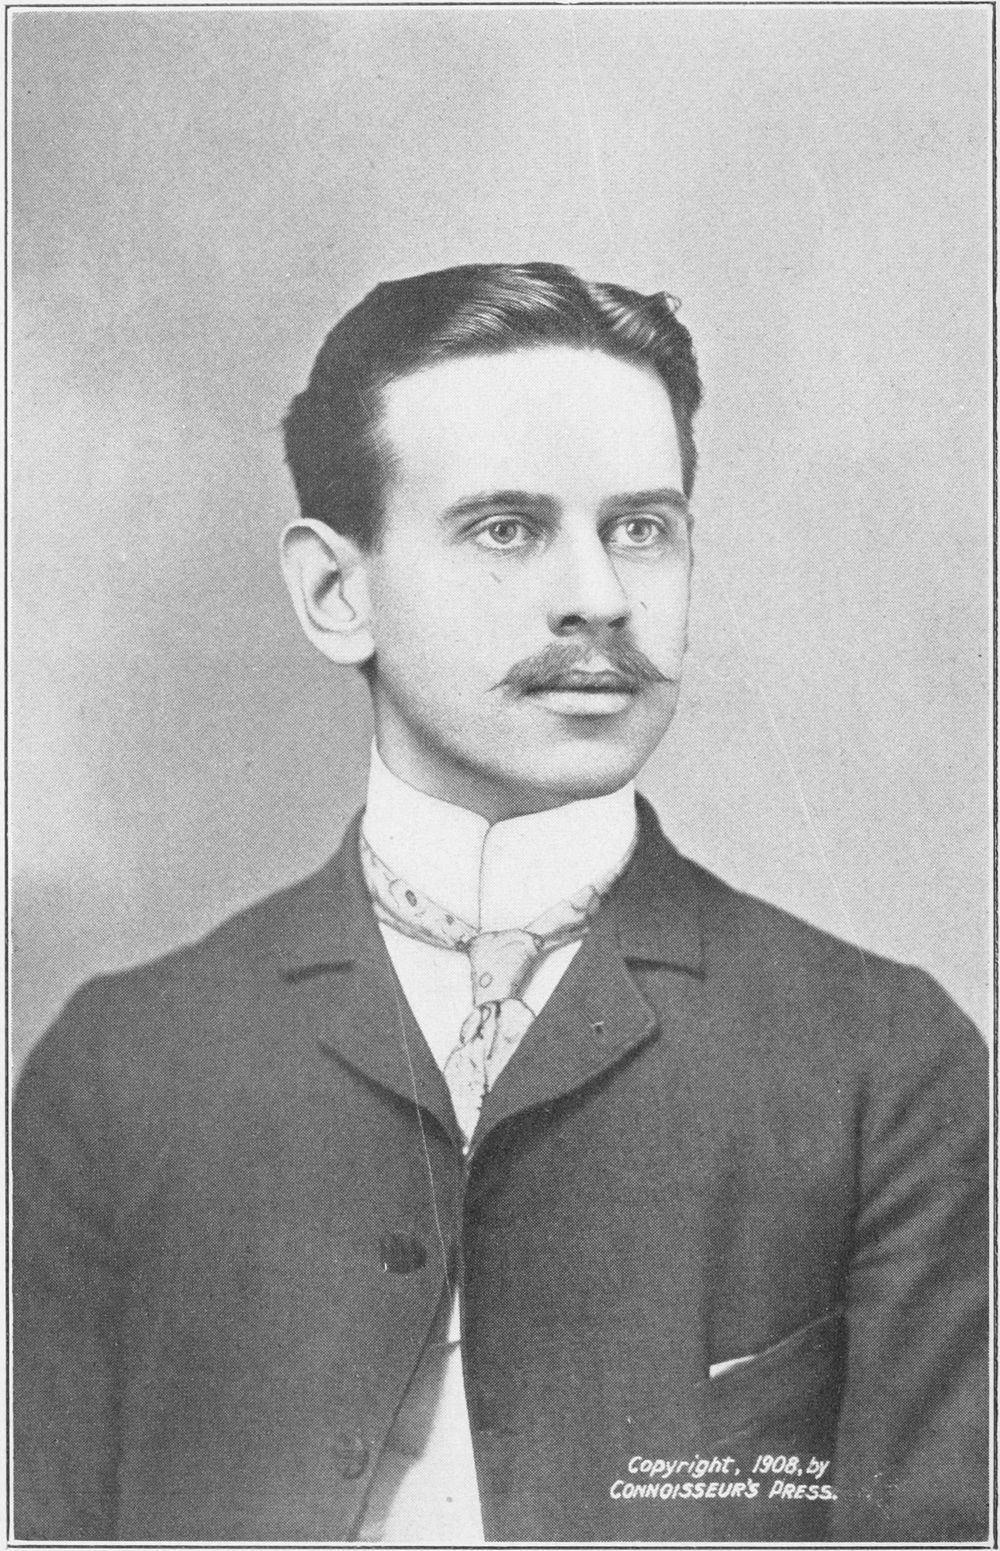 Jean Louis De Esque